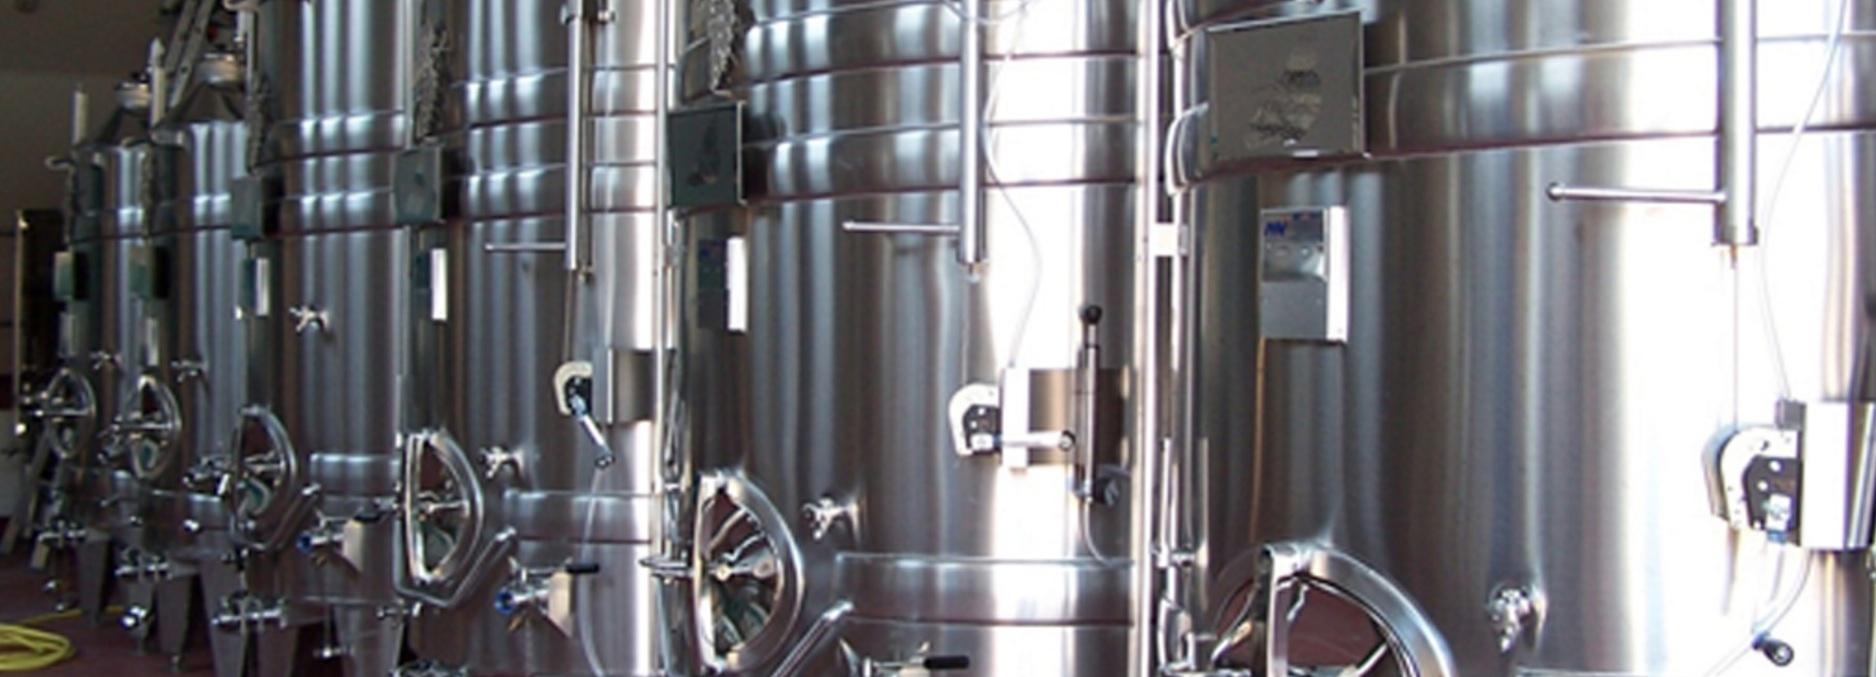 Hattingley Valley English Wine Production Vessles